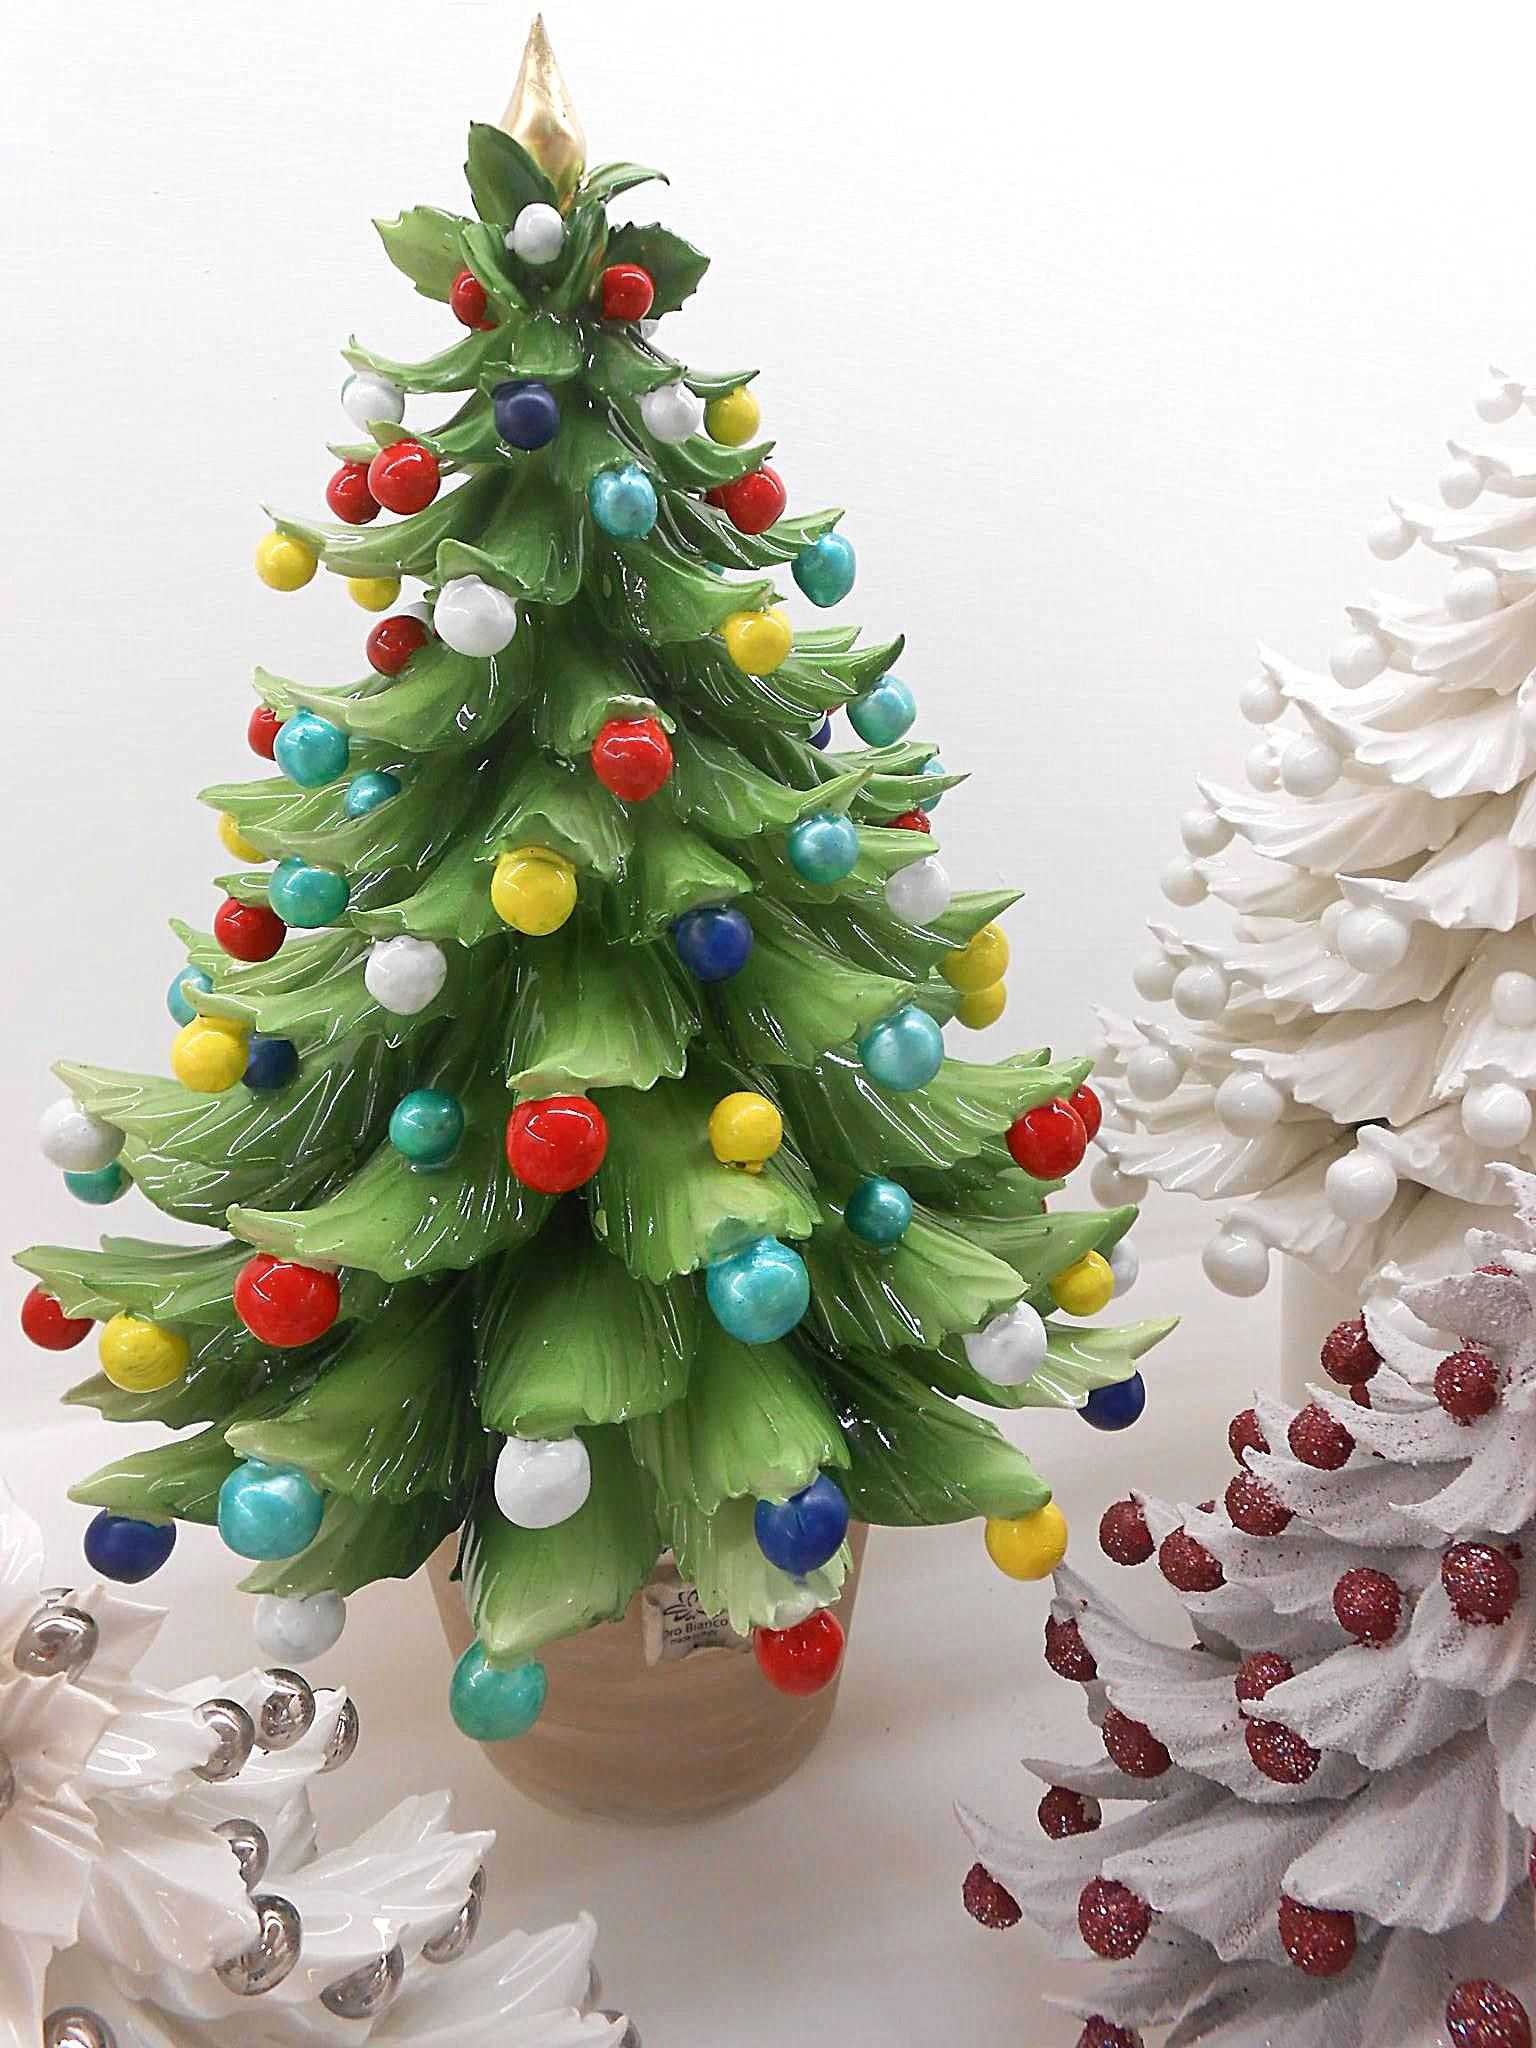 Alberelli Di Natale.Alberi Natalizi Abeti Alberi Di Natale In Porcellana Di